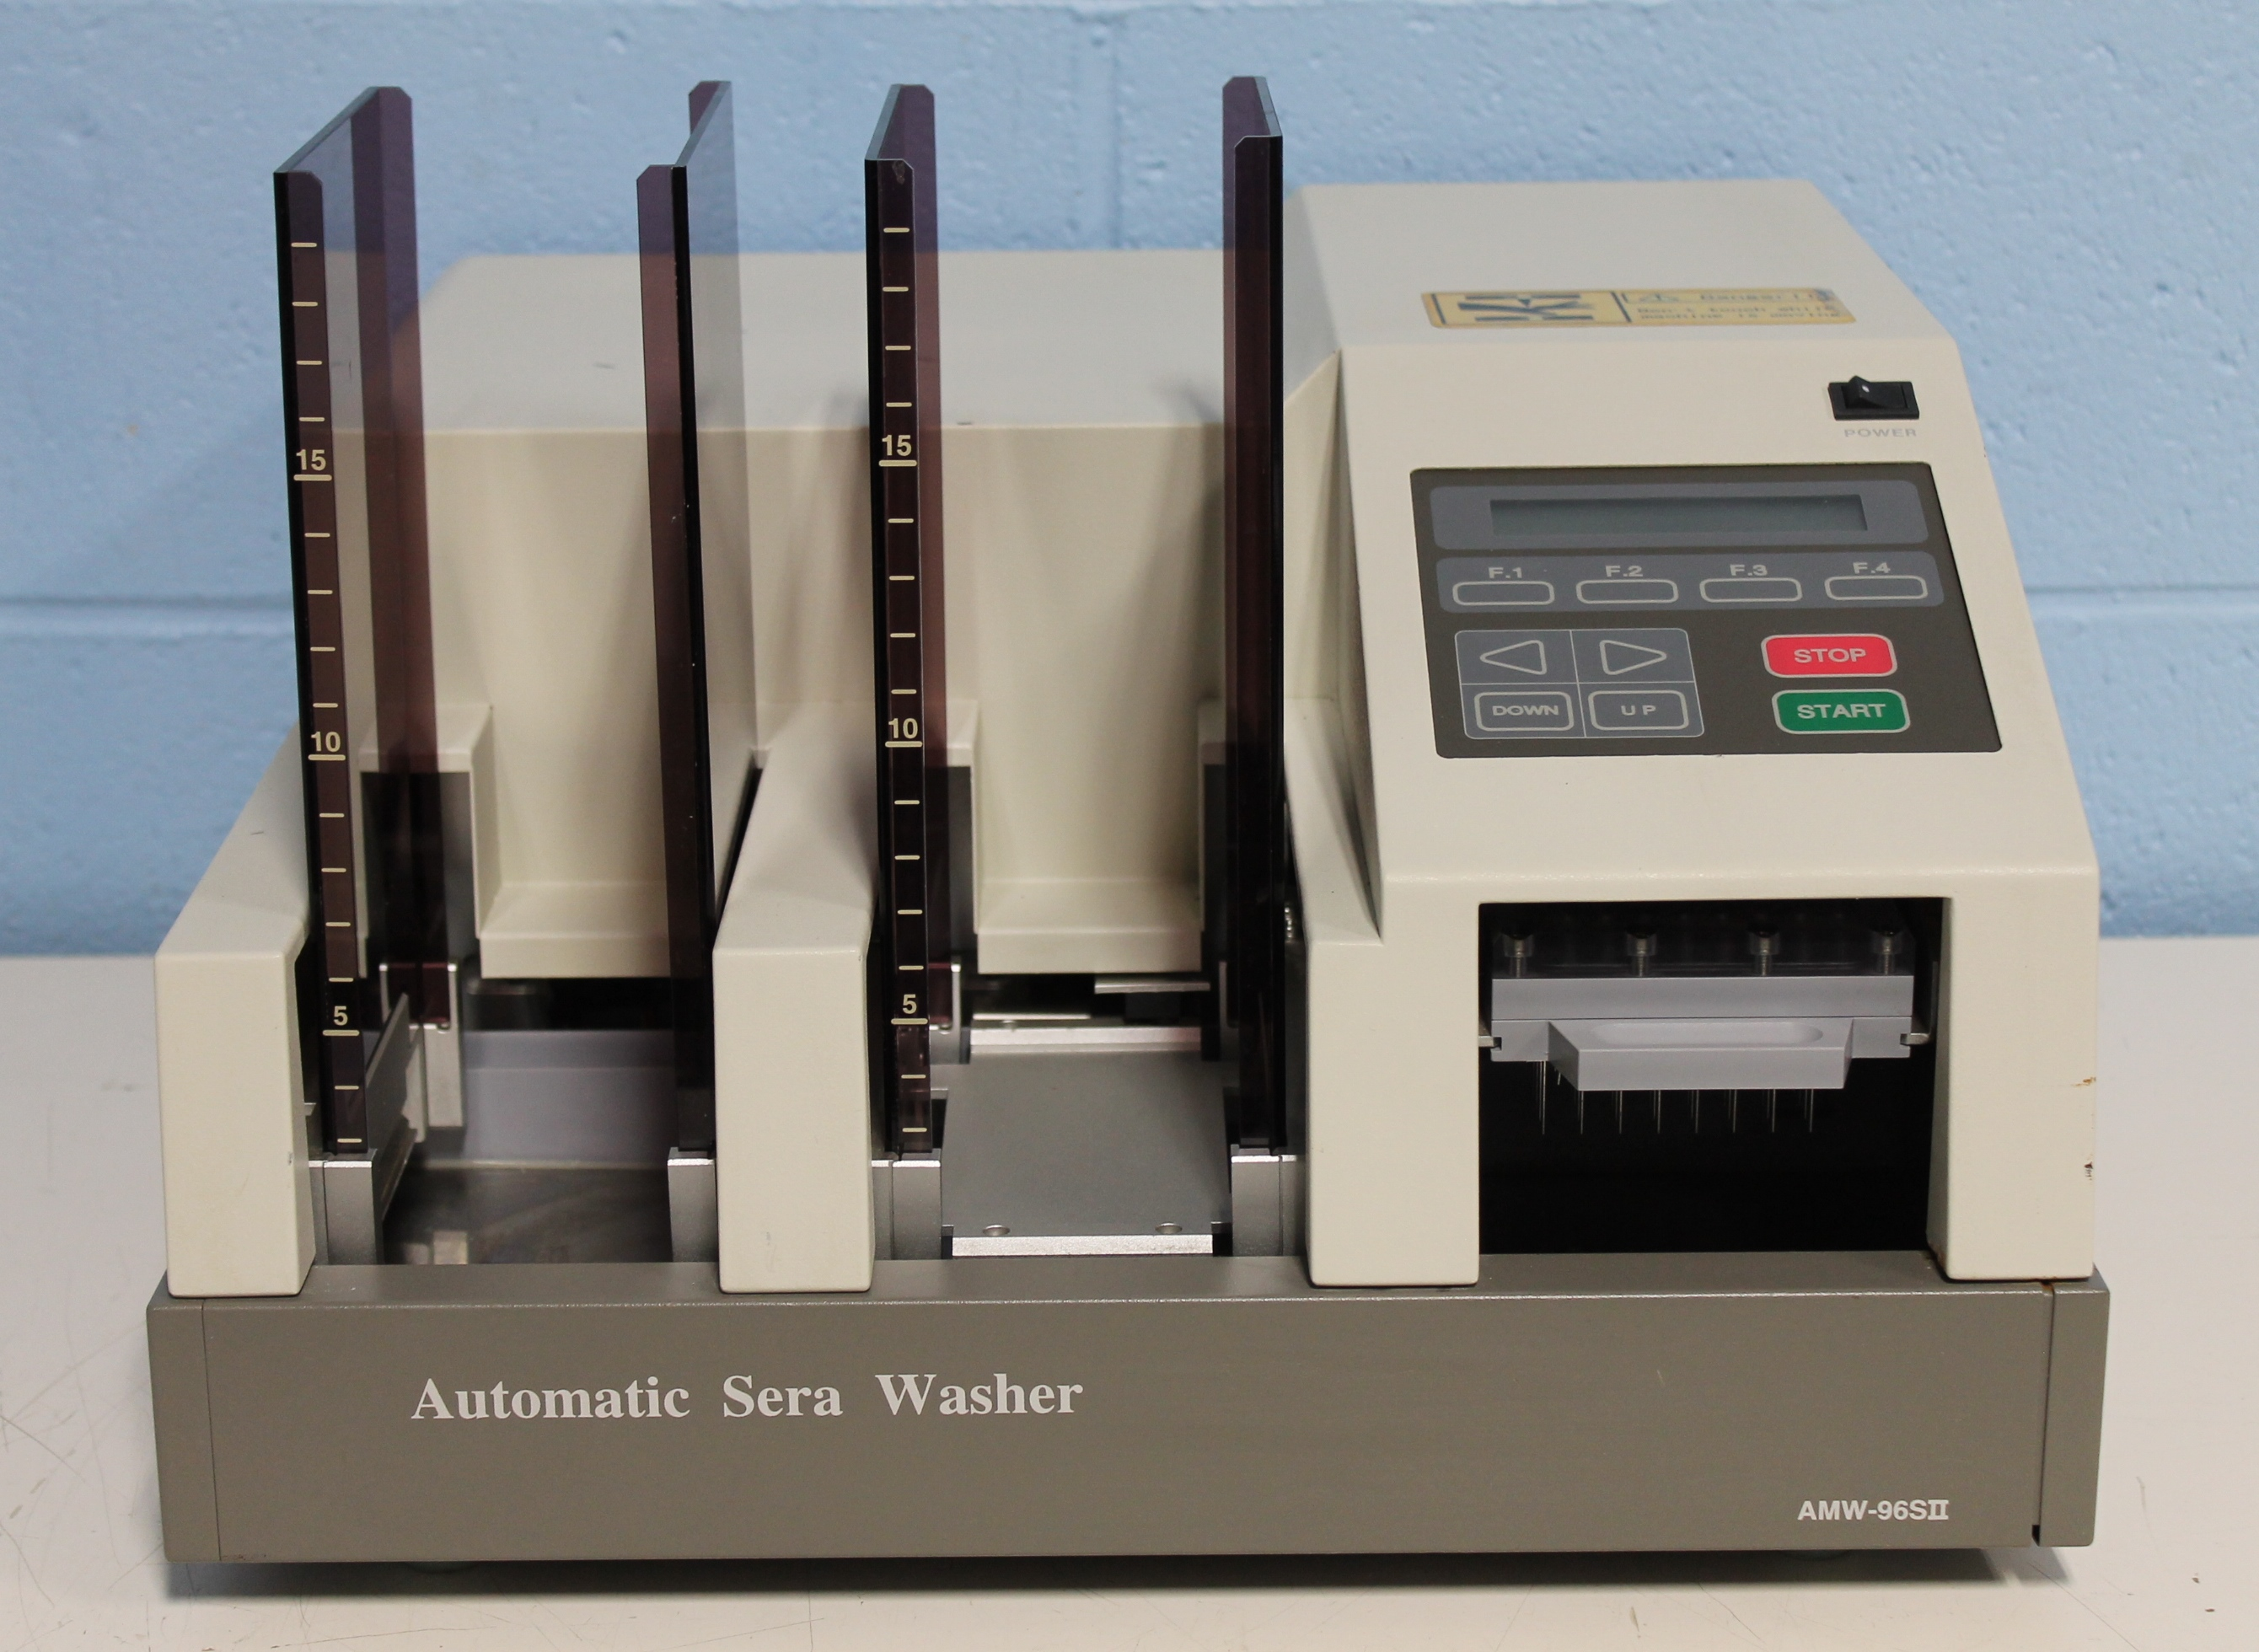 Biotec Automatic Sera Washer AMW-96SII Image